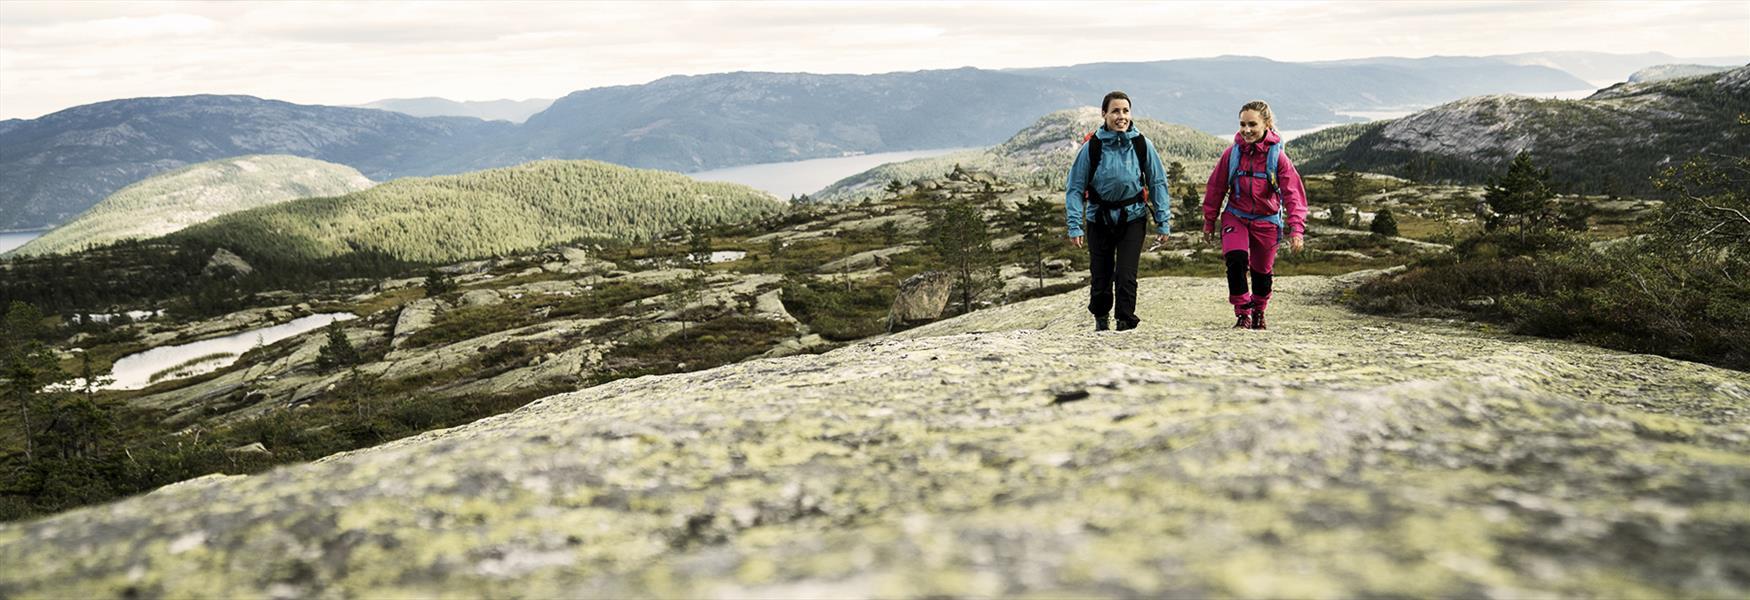 Hægefjell i Telemark